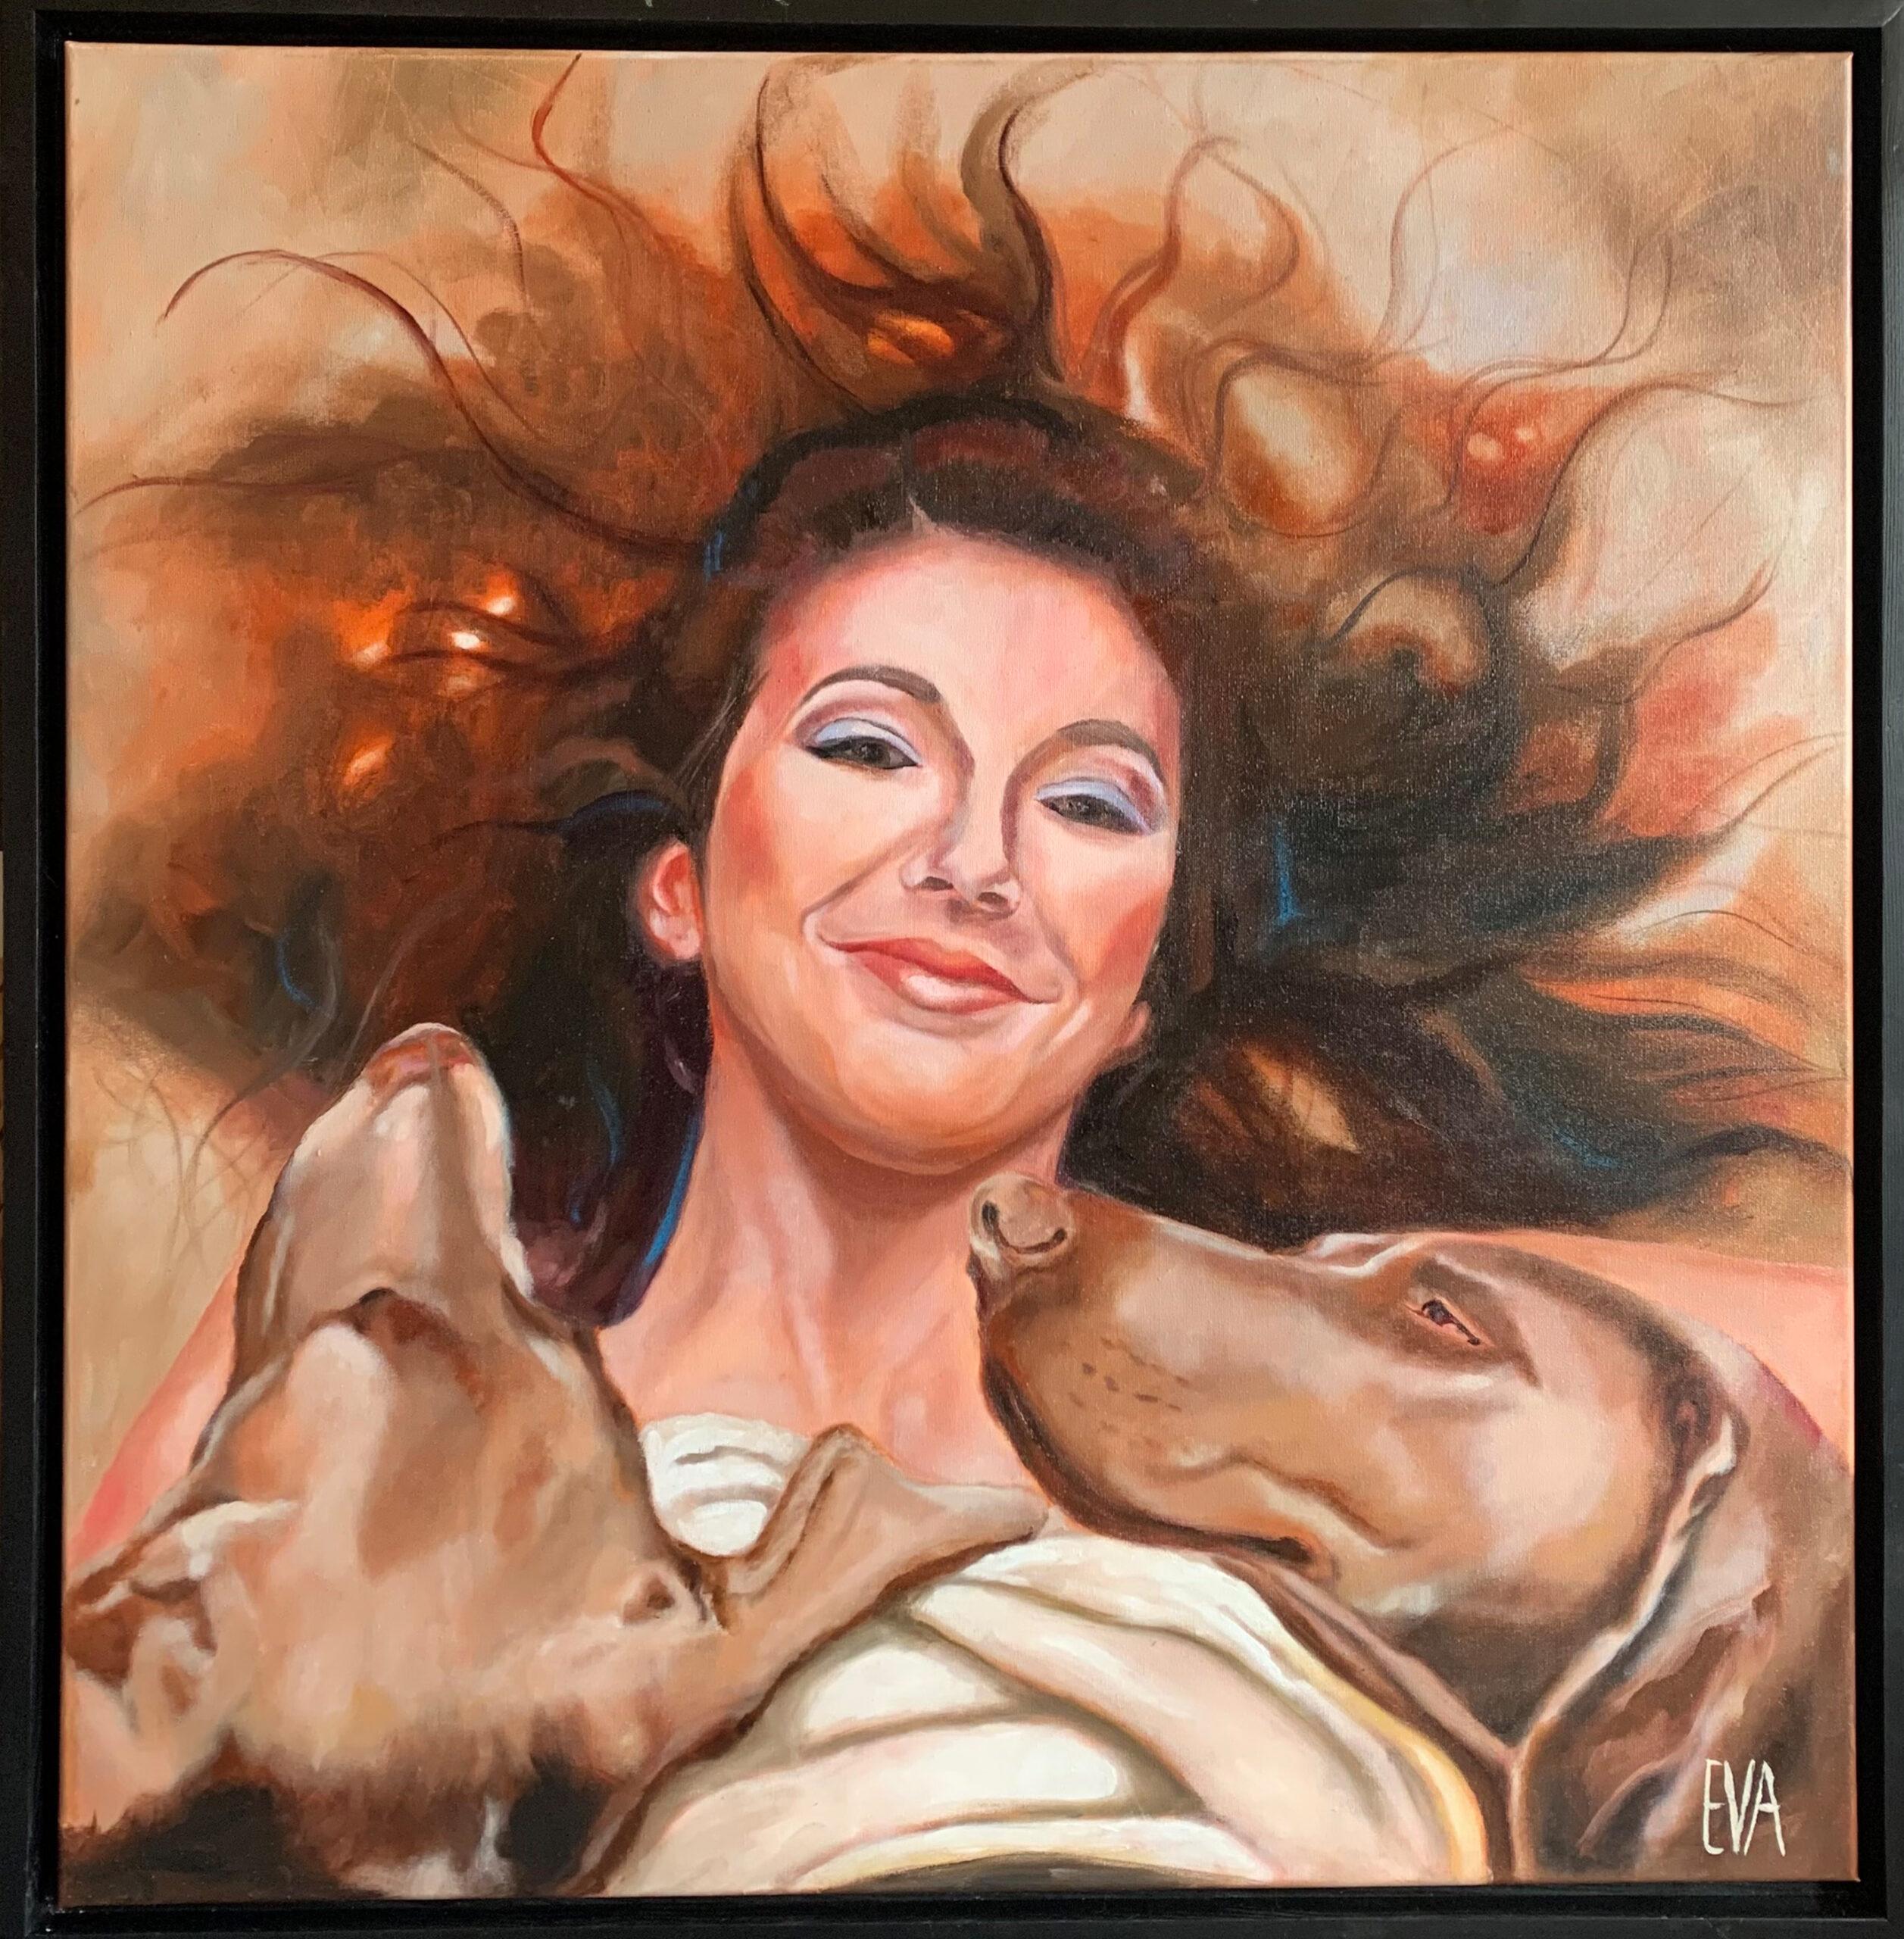 Kate Bush hounds of love